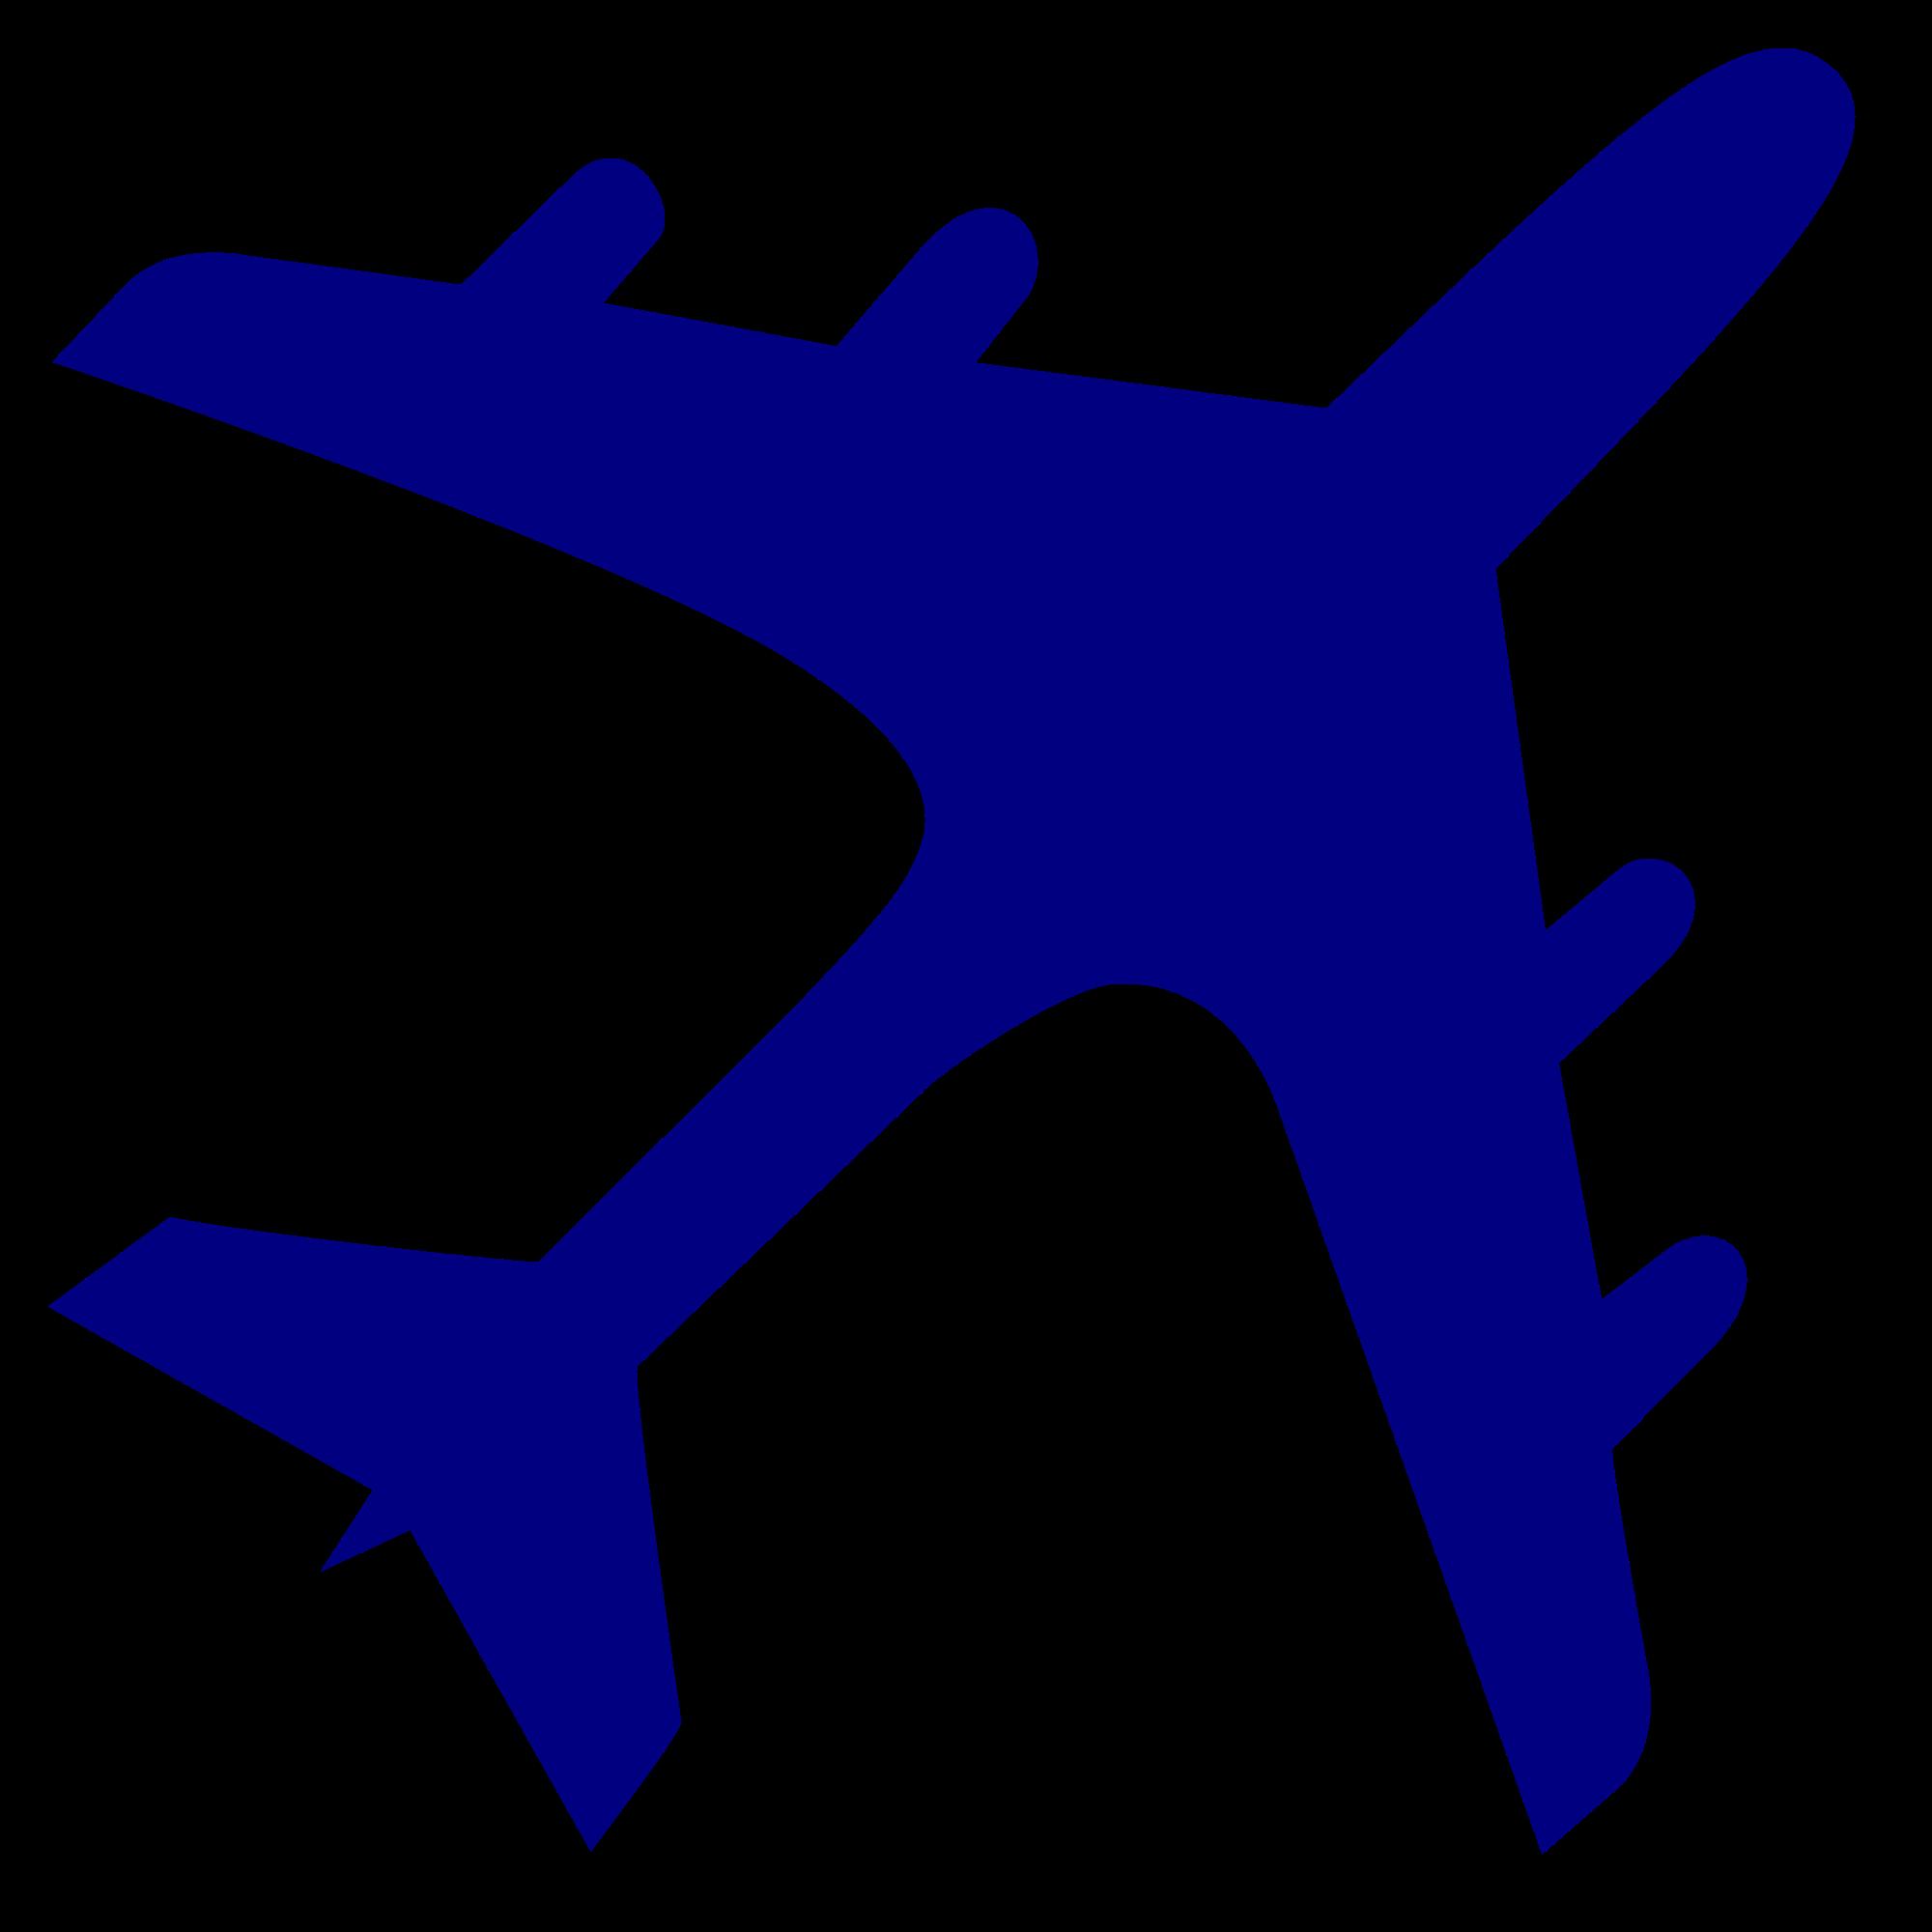 Navy silhouette